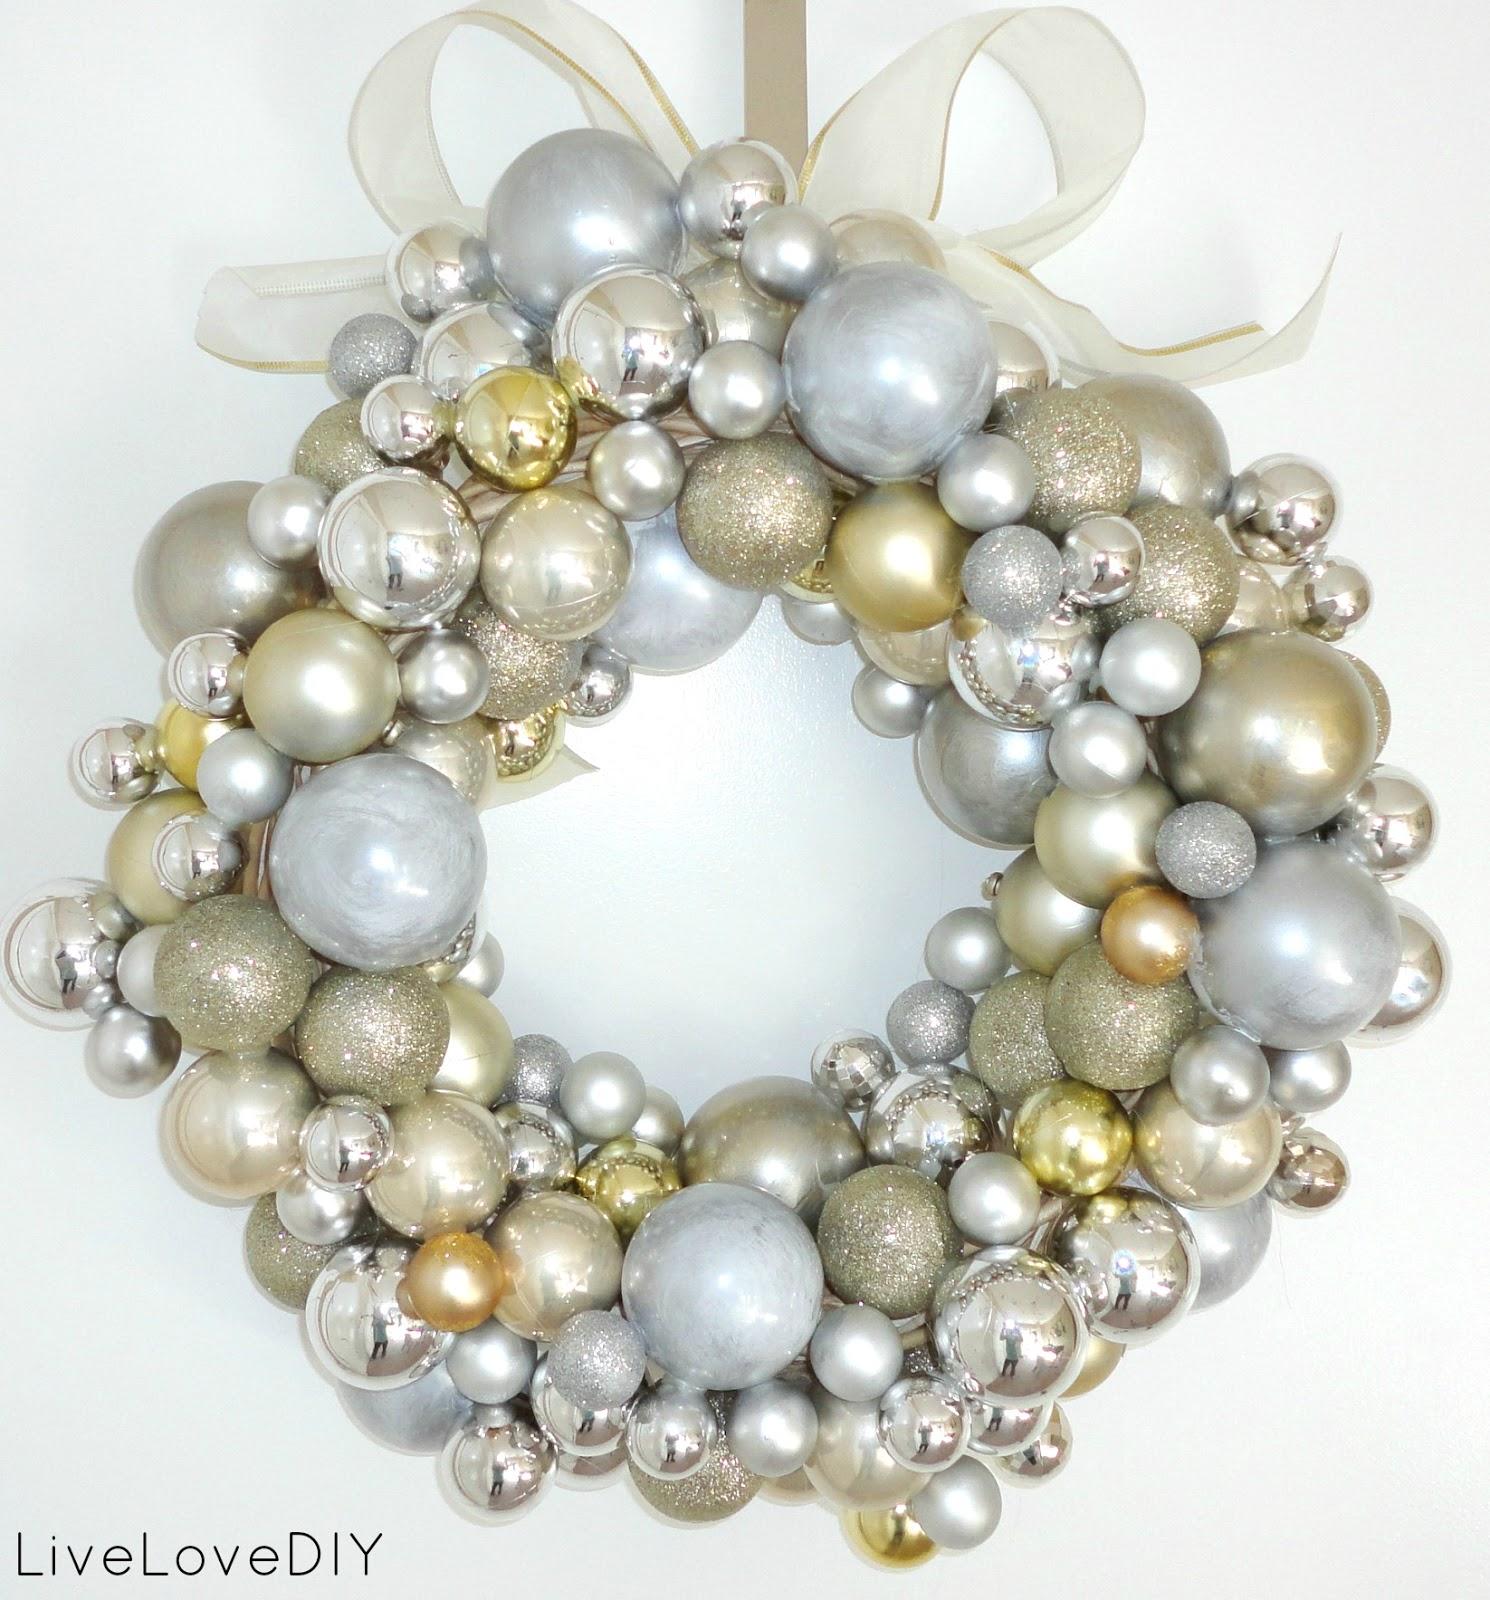 Livelovediy december 2012 christmas ornament wreaths reader versions solutioingenieria Image collections